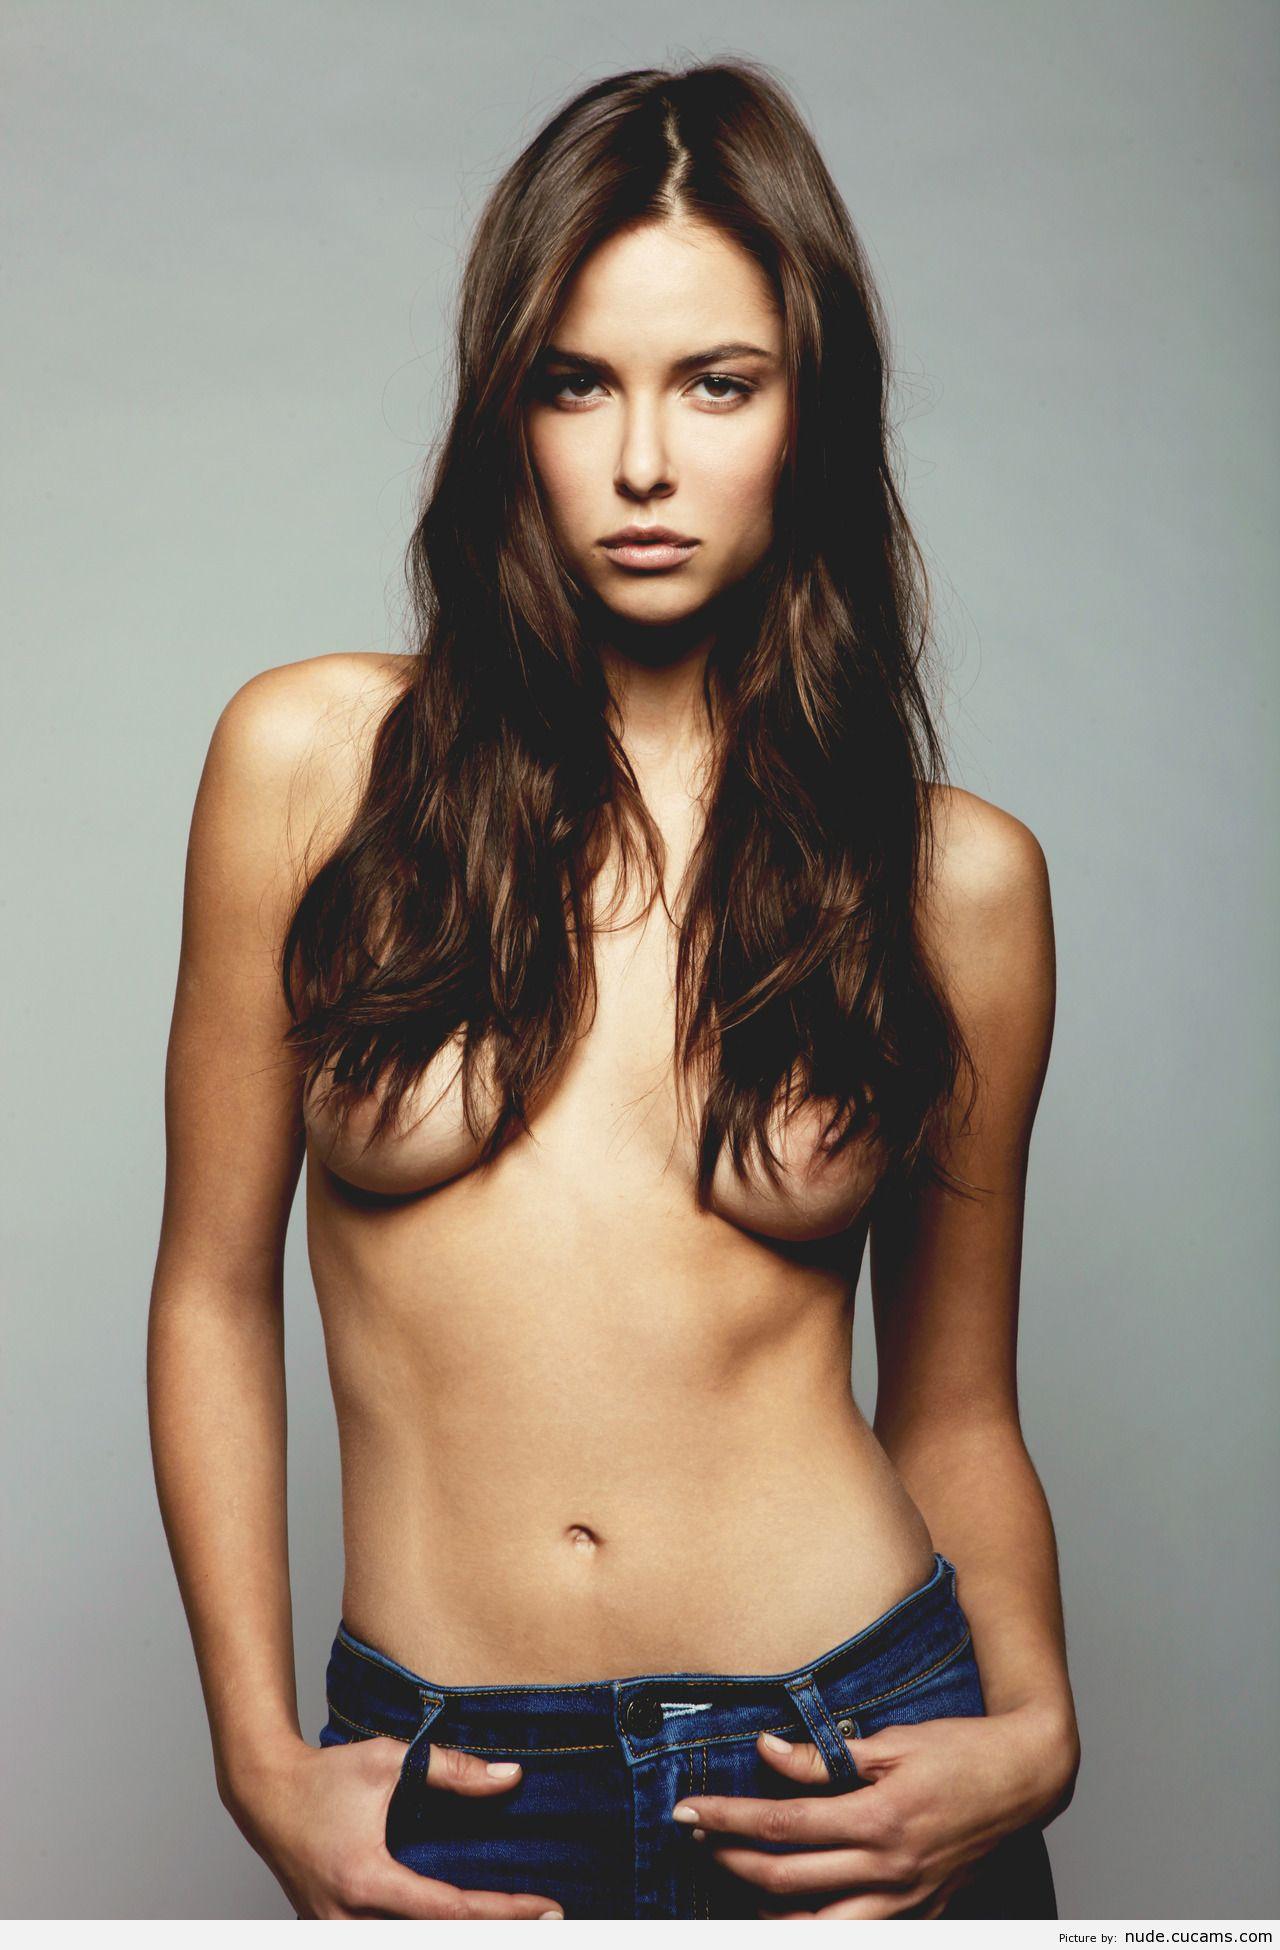 Nude Uncensored Toilet by nude.cucams.com